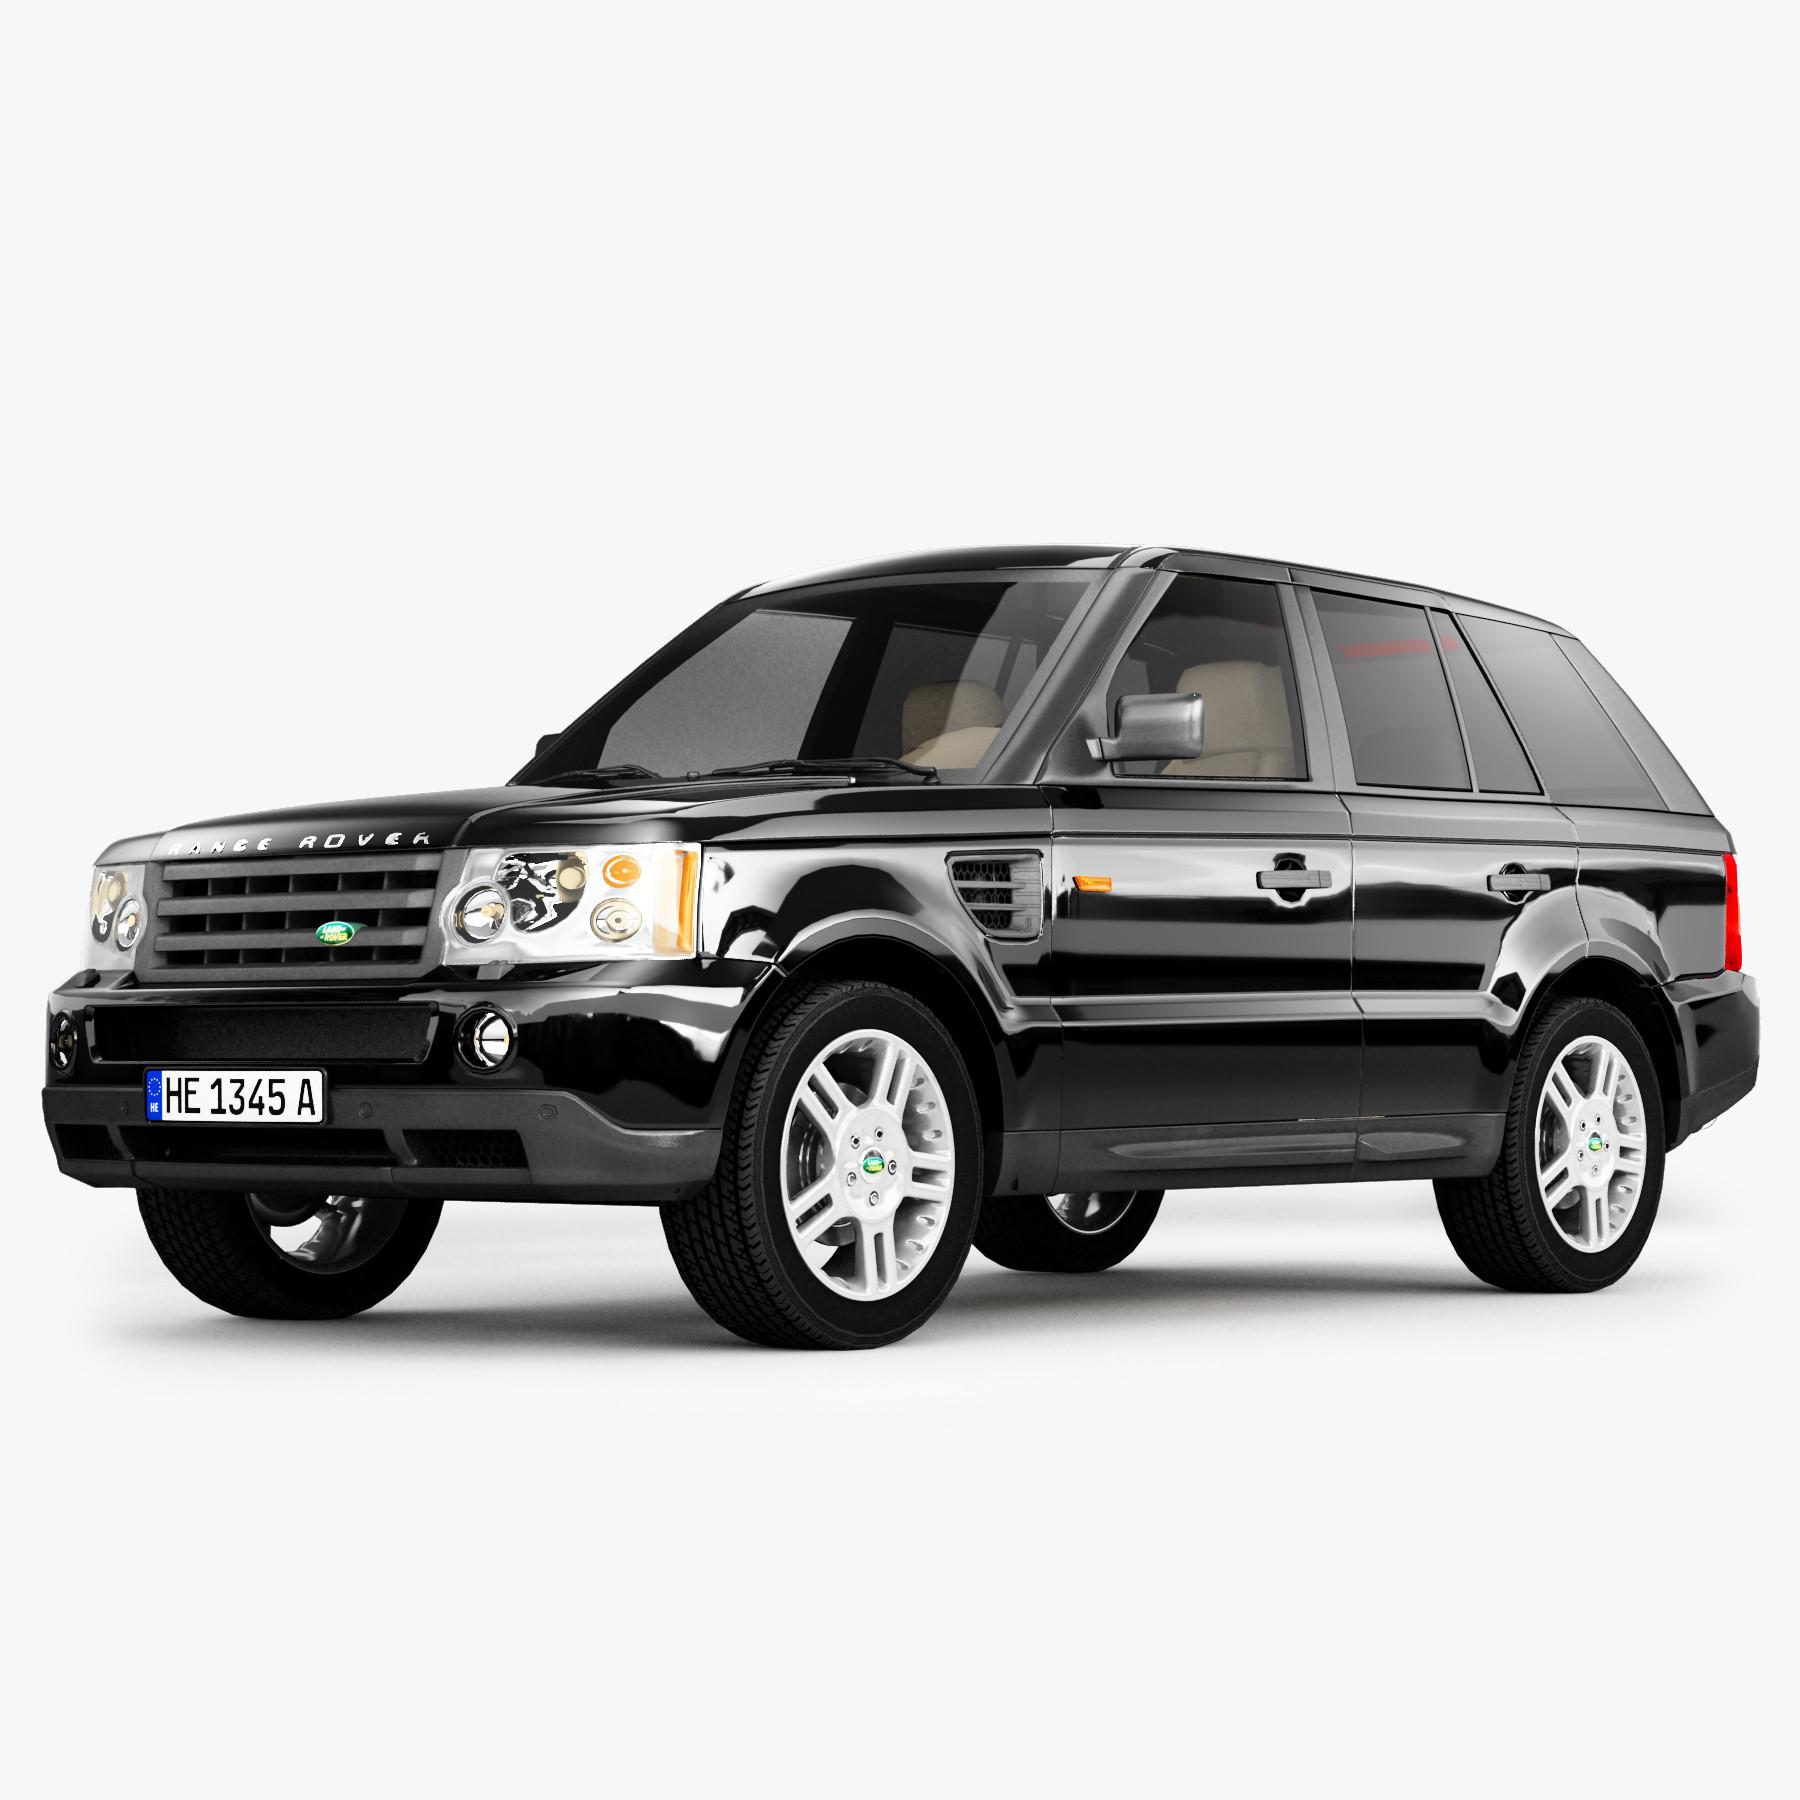 Land Rover Suv: 3d Range Rover Suv Model